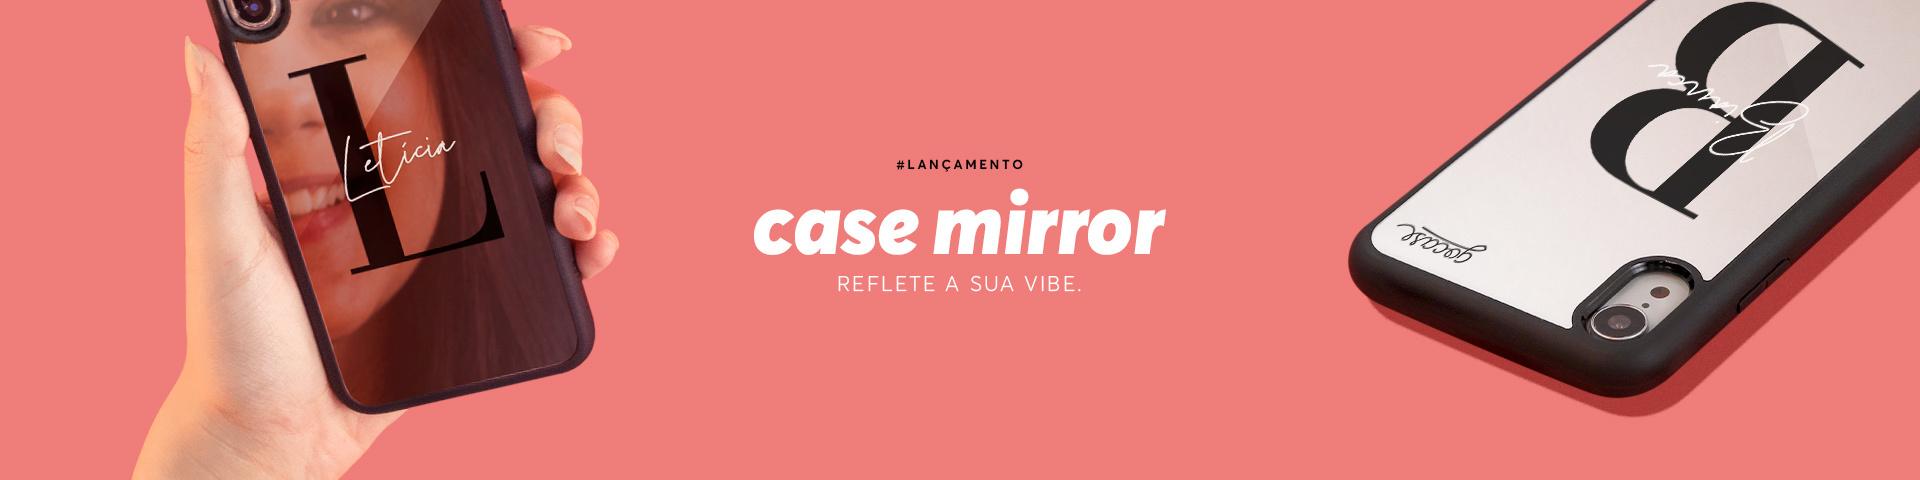 Casemirror desktop collection